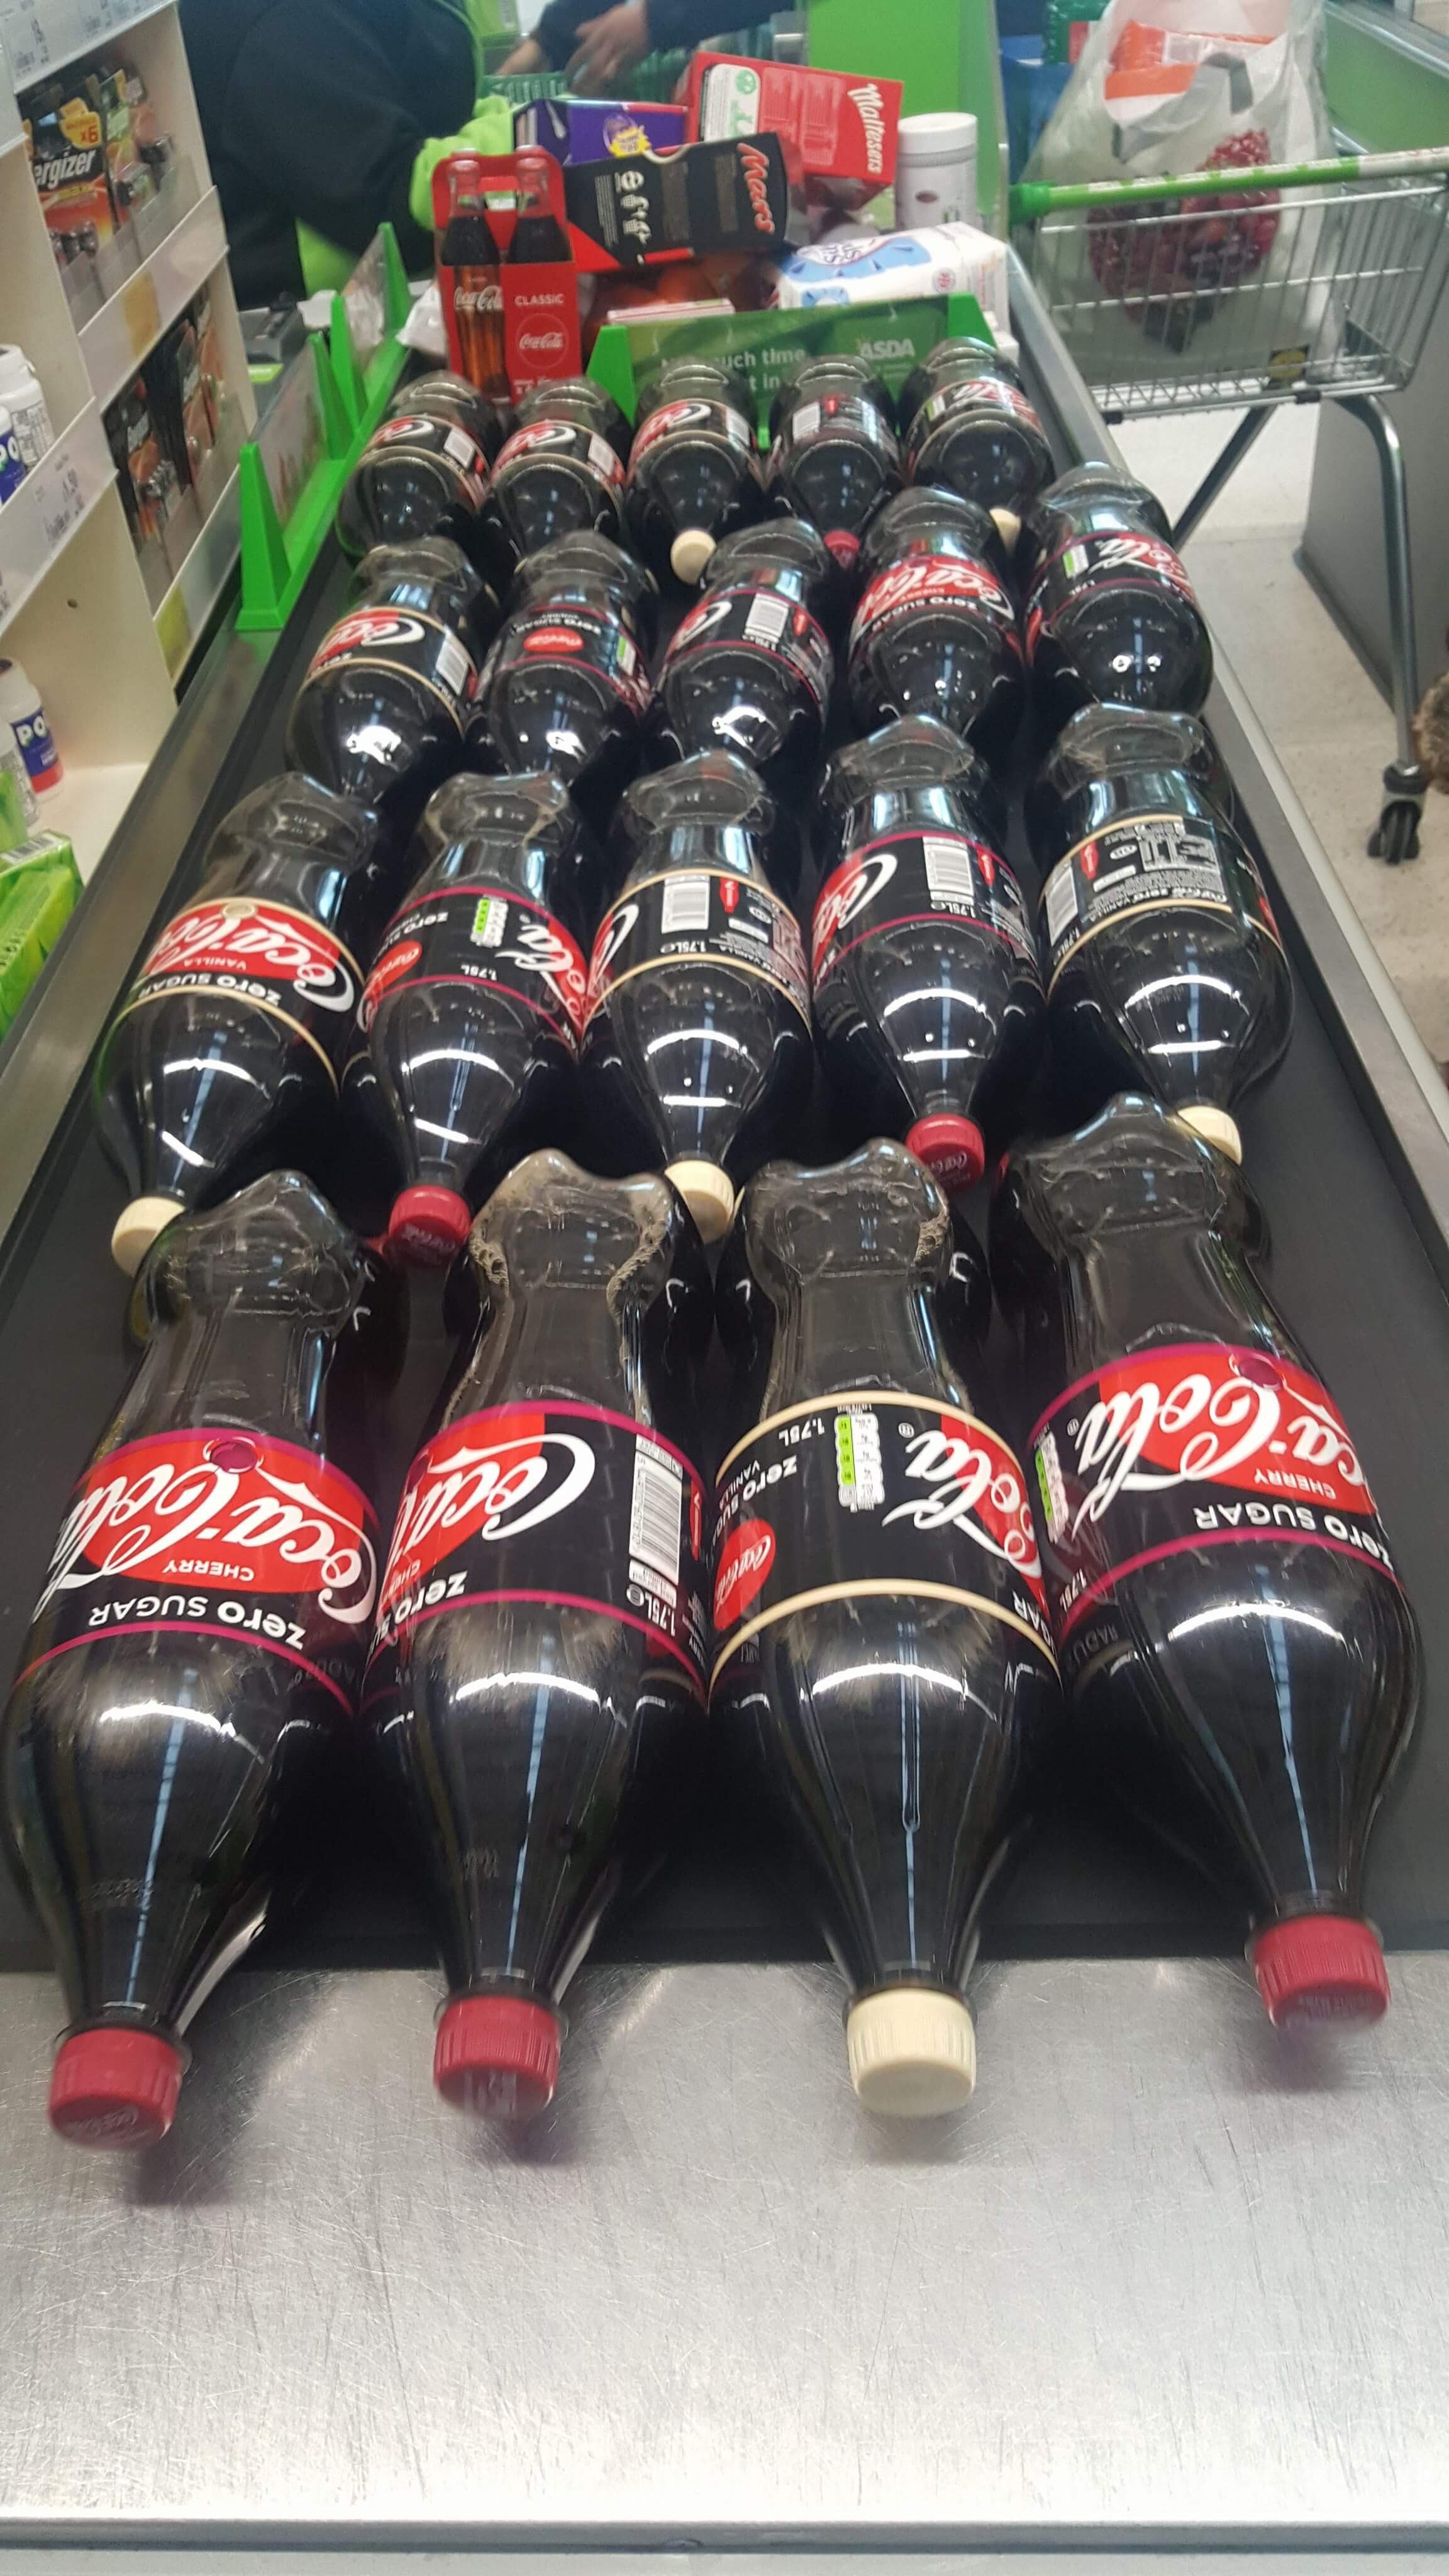 Coke Zero 1.75L reduced 75p in Asda